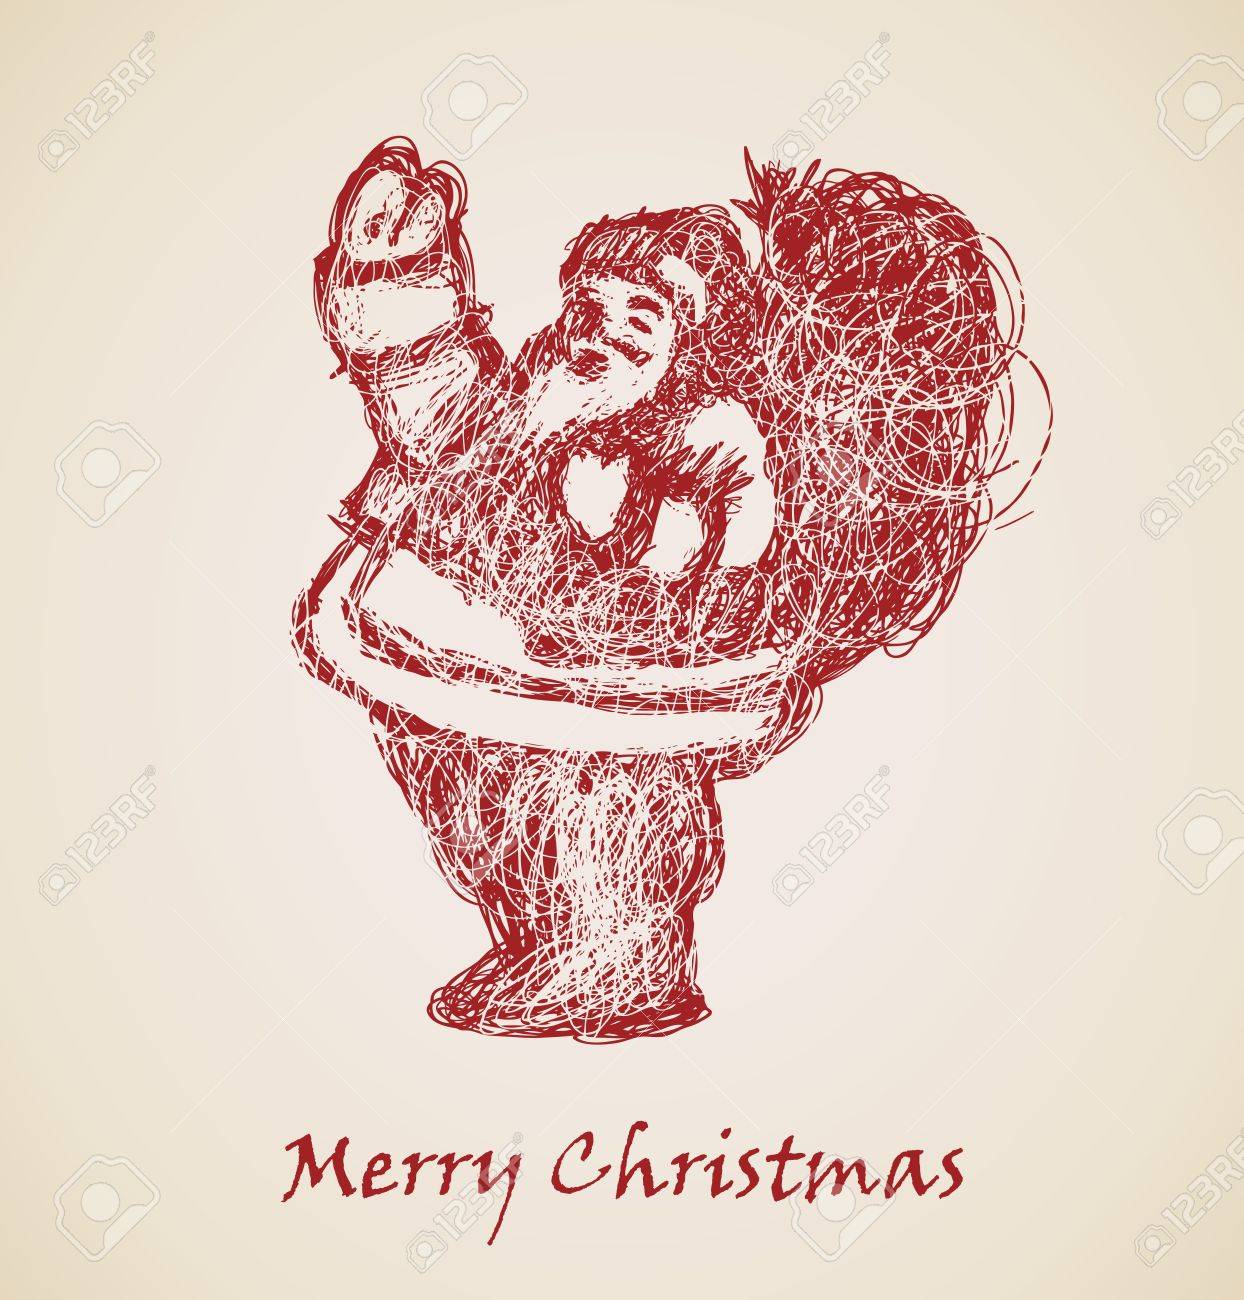 Santa Claus Sketch, élément De Conception De Noël Clip Art Libres De ...